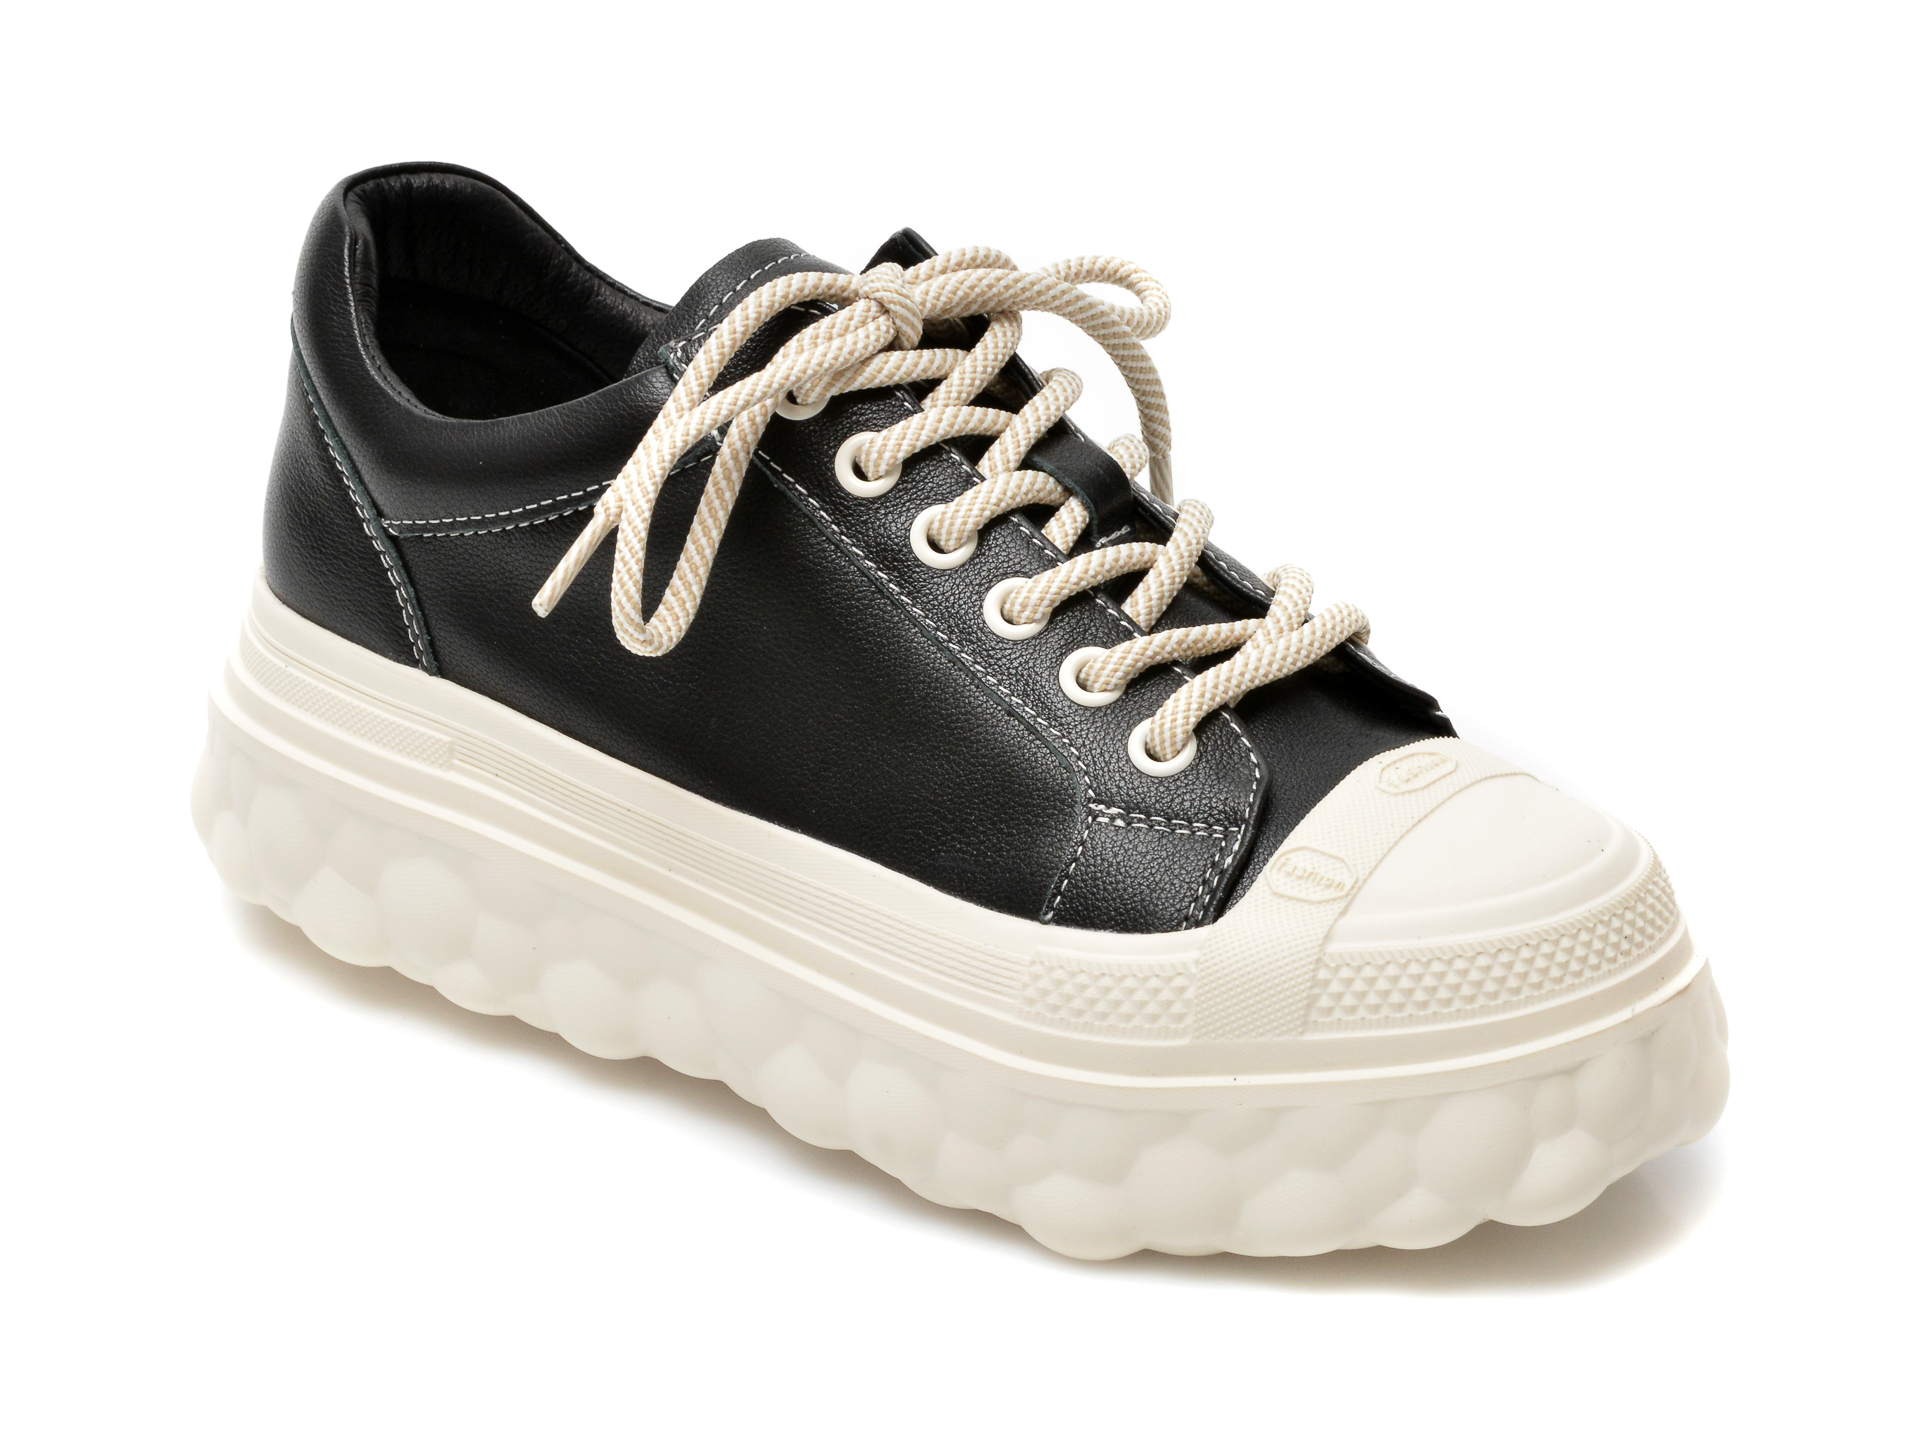 Pantofi sport GRYXX negri, A2152, din piele naturala imagine otter.ro 2021